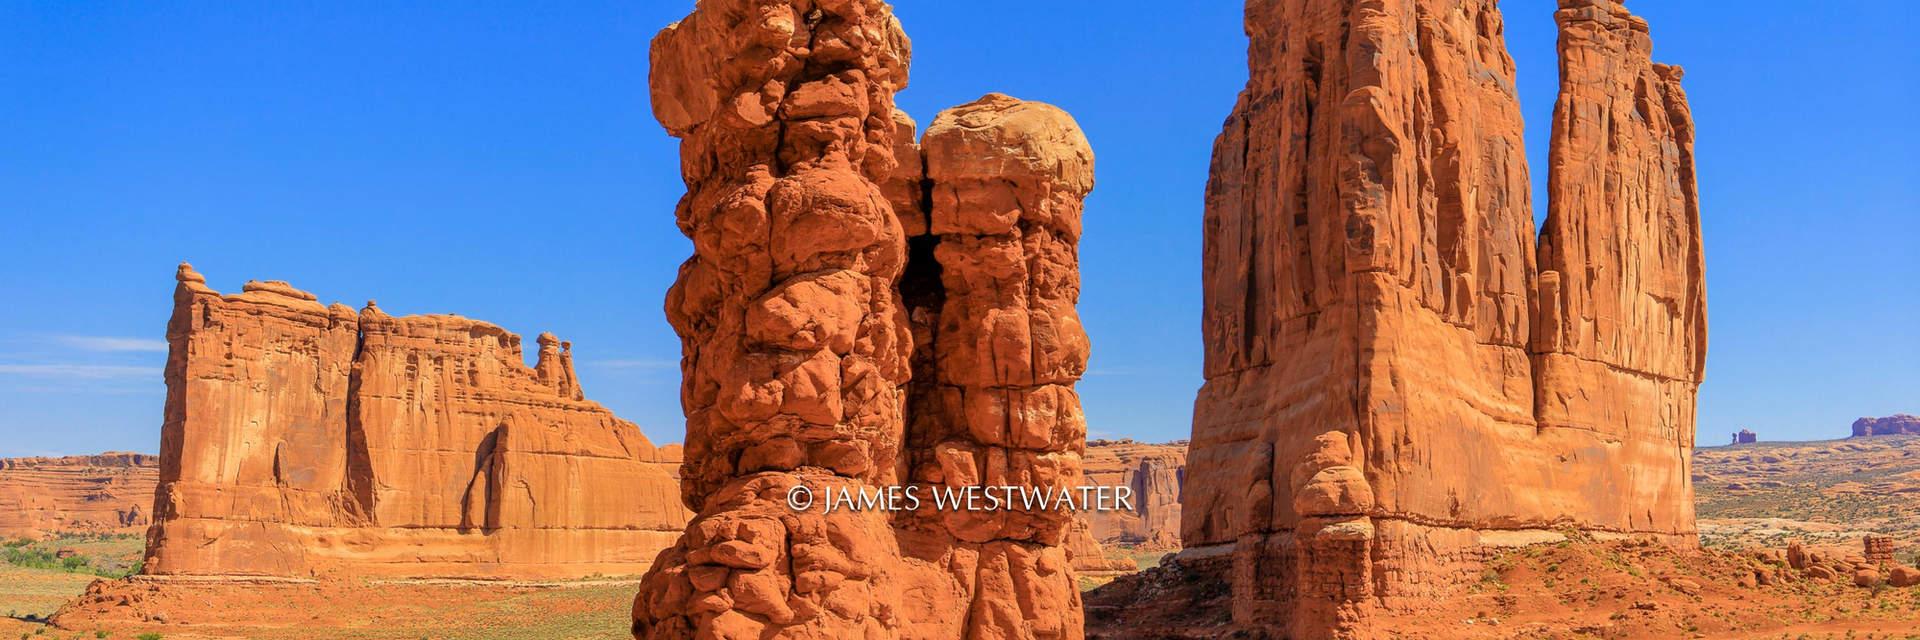 Arches Trio, Arches National Park, Utah